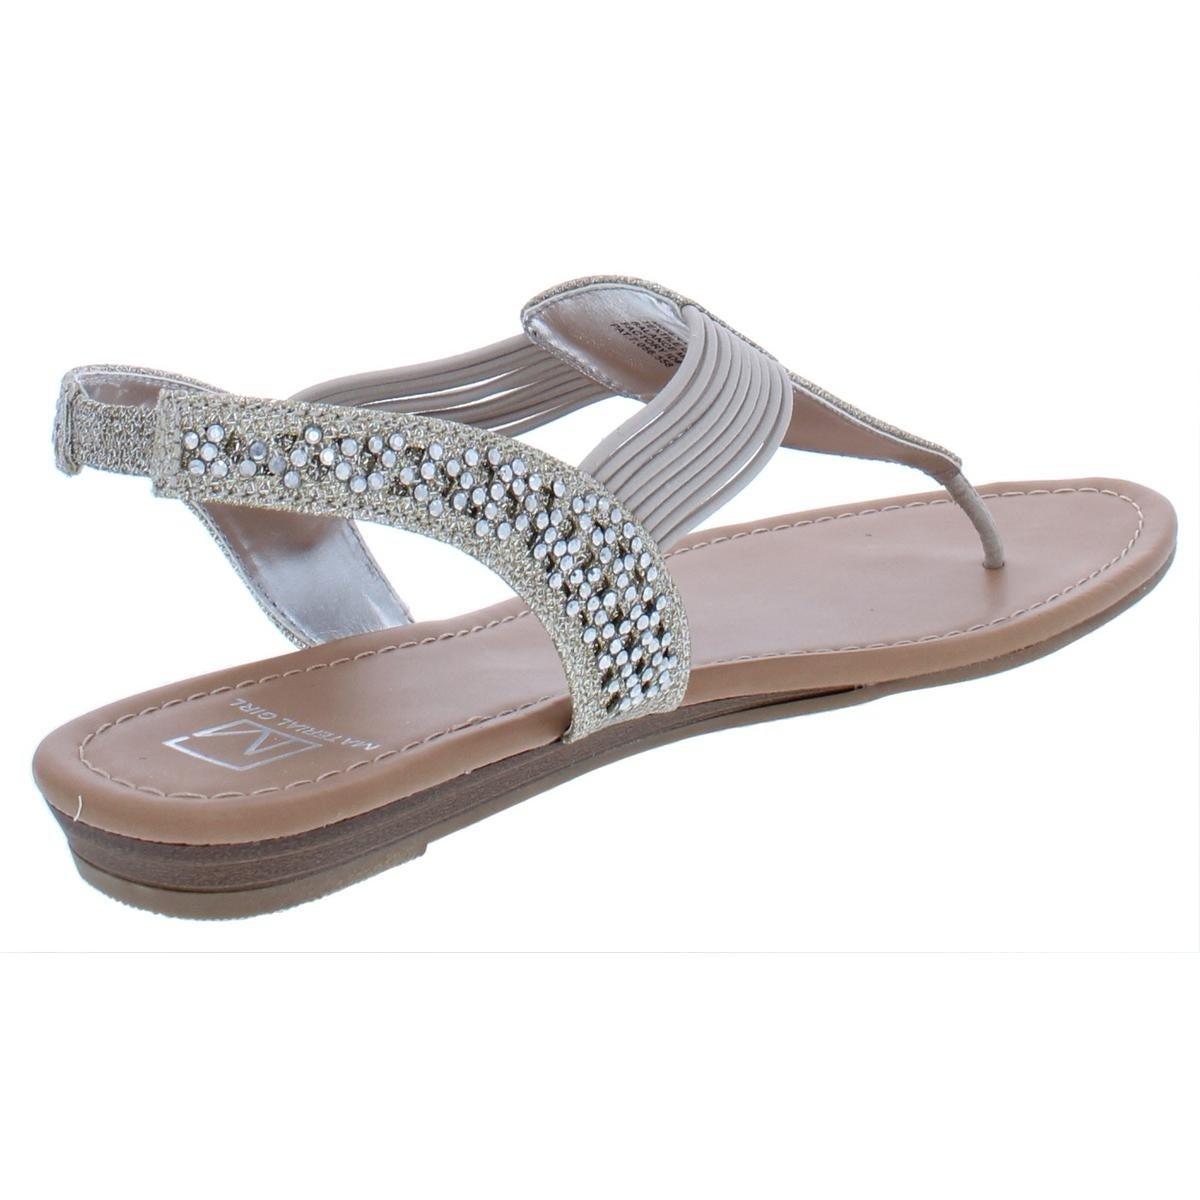 00bc34f7547 Shop Material Girl Womens Siera T-Strap Sandals Glitter Small Wedge - 9.5  Medium (B